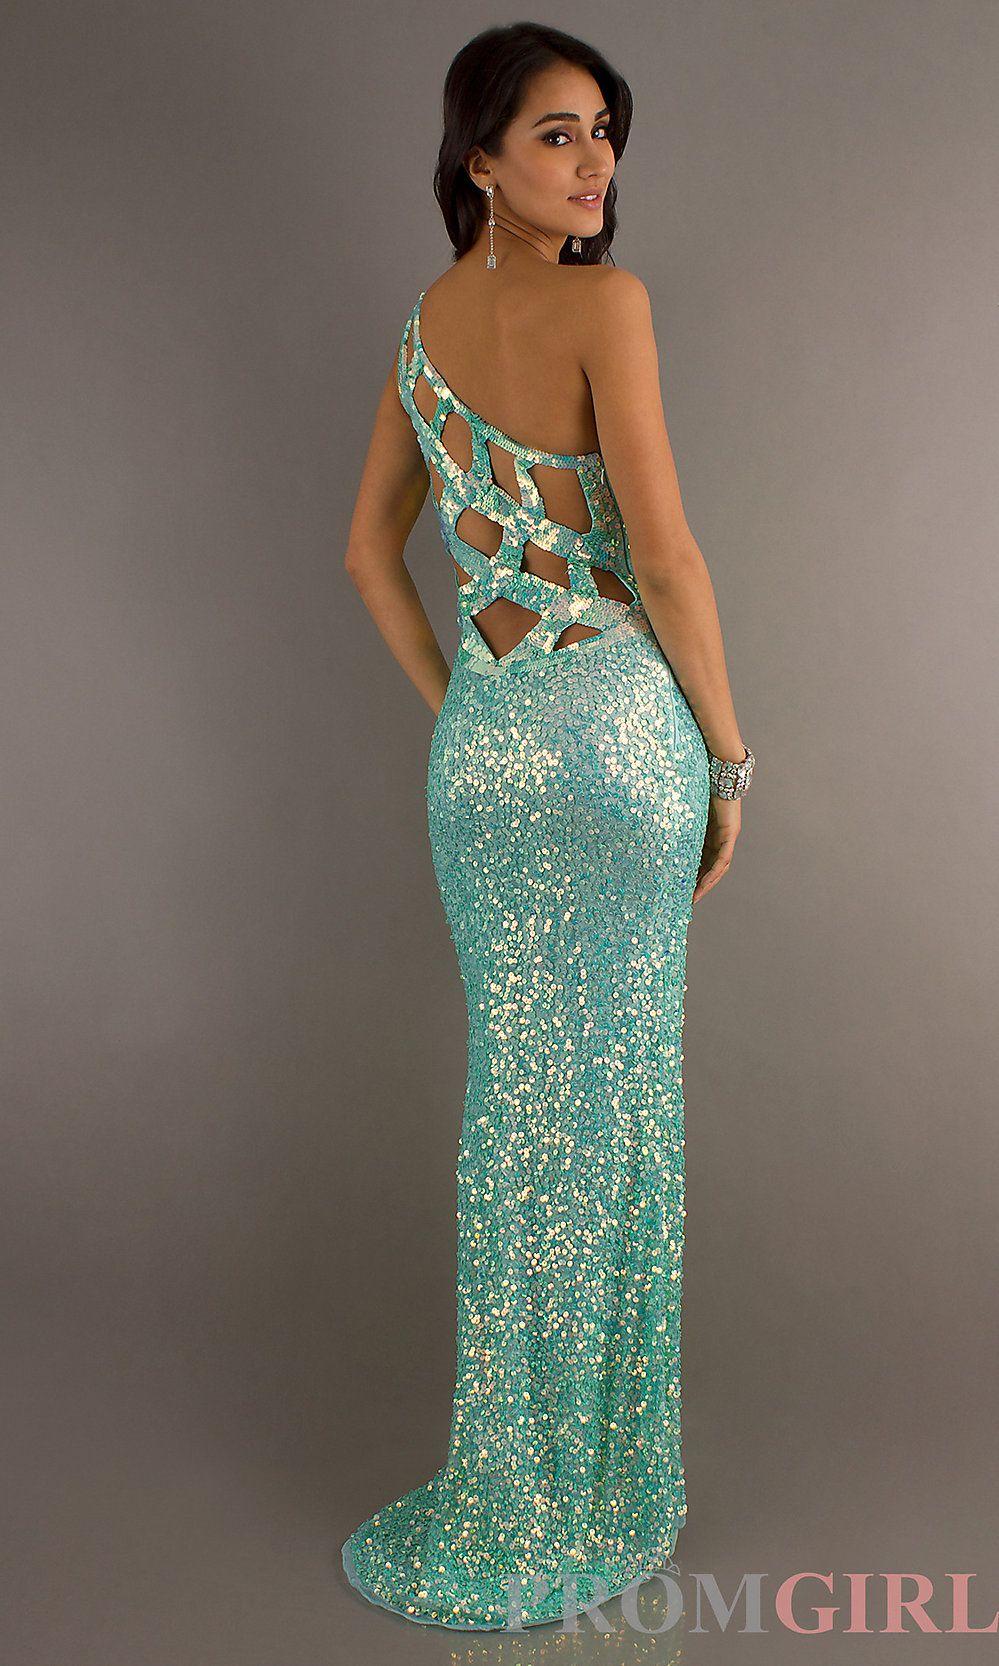 Primavera One Shoulder Sequin Prom Dress b8308a399